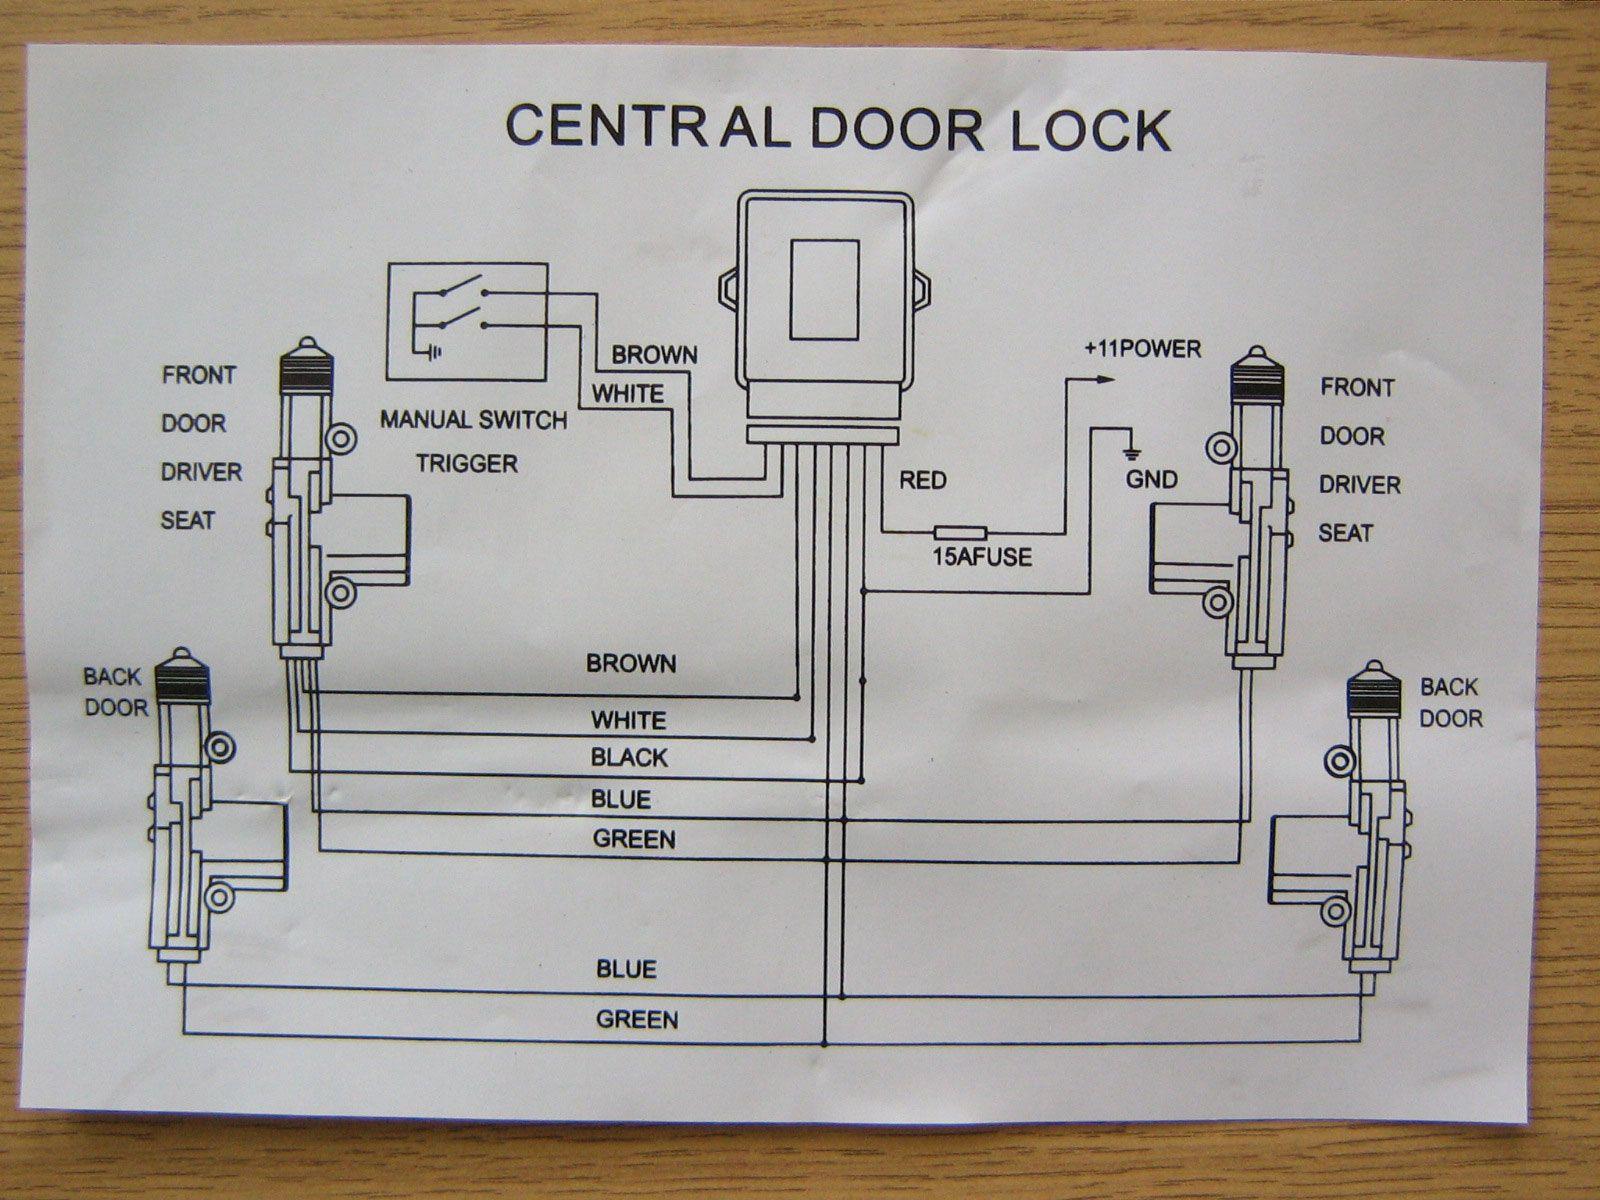 VE_8856] Vs Commodore Central Locking Wiring DiagramHeeve Ospor Ginia Phae Birdem Kicep Faun Dict Iness Bedr Phae  Mohammedshrine Librar Wiring 101